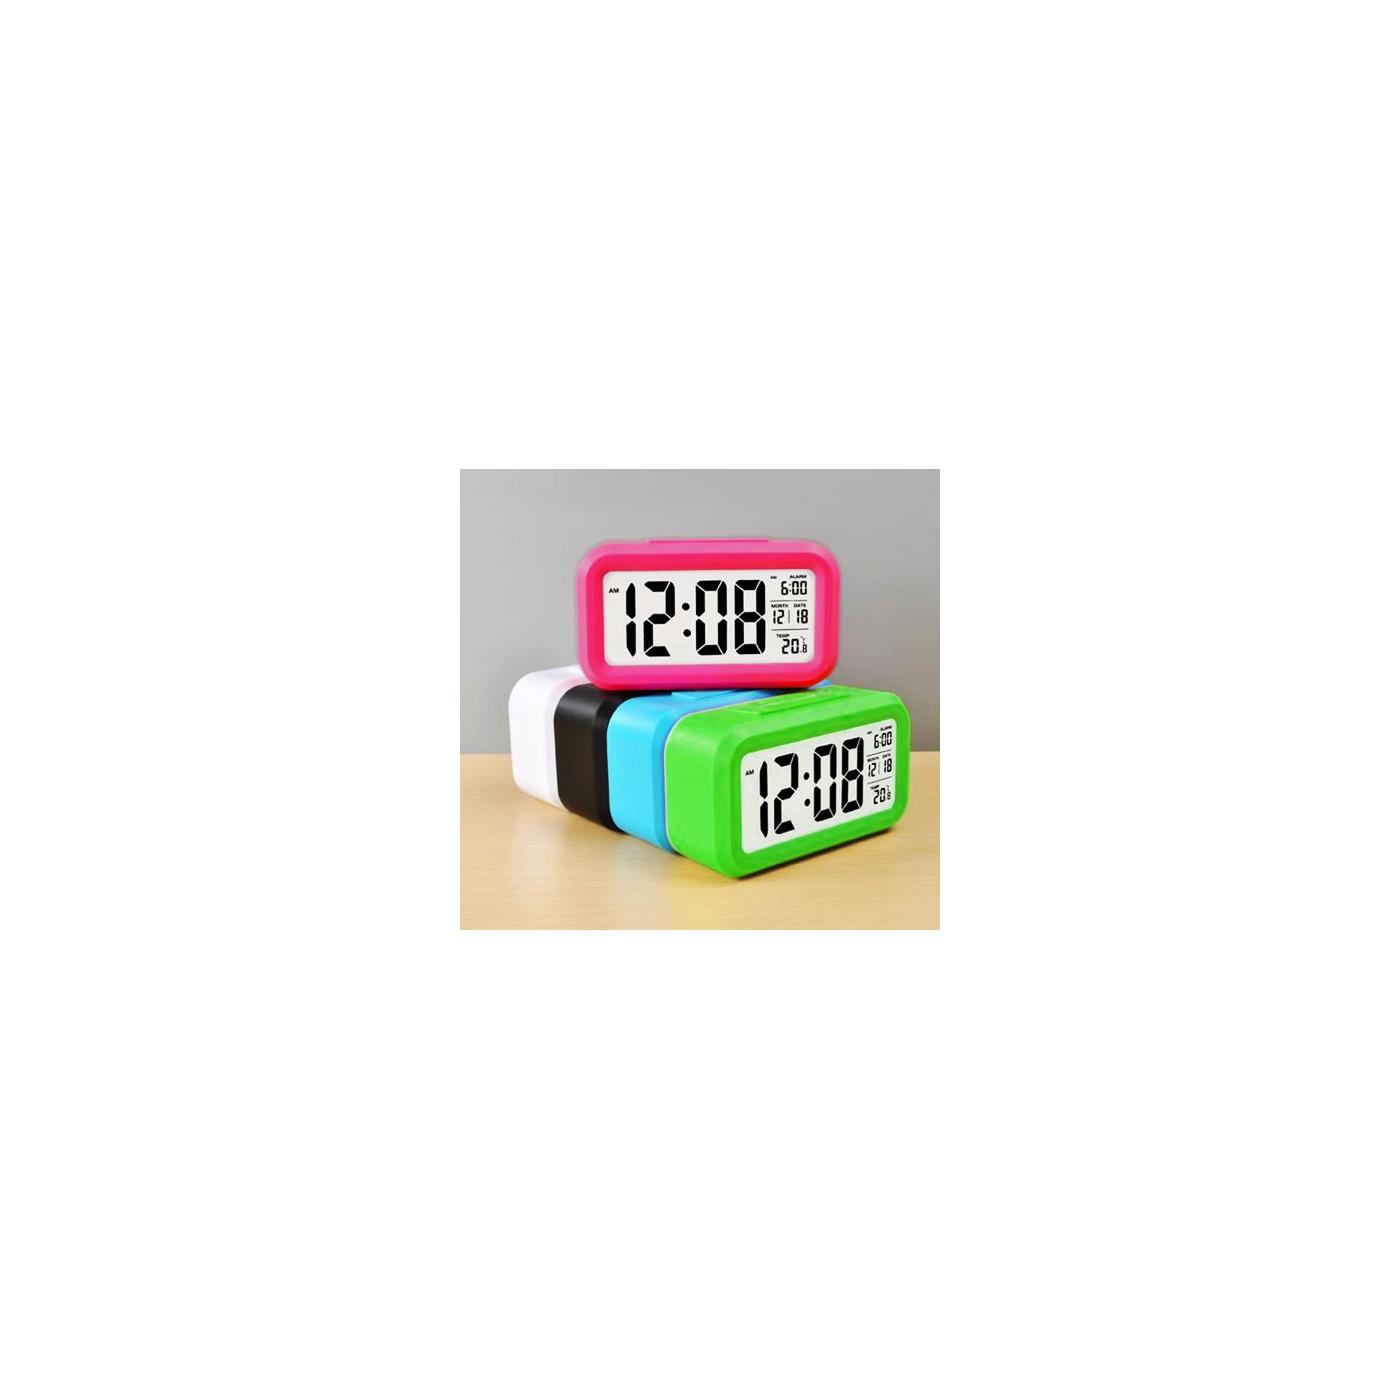 Moderne alarmklok/wekker in vrolijke kleur: roze